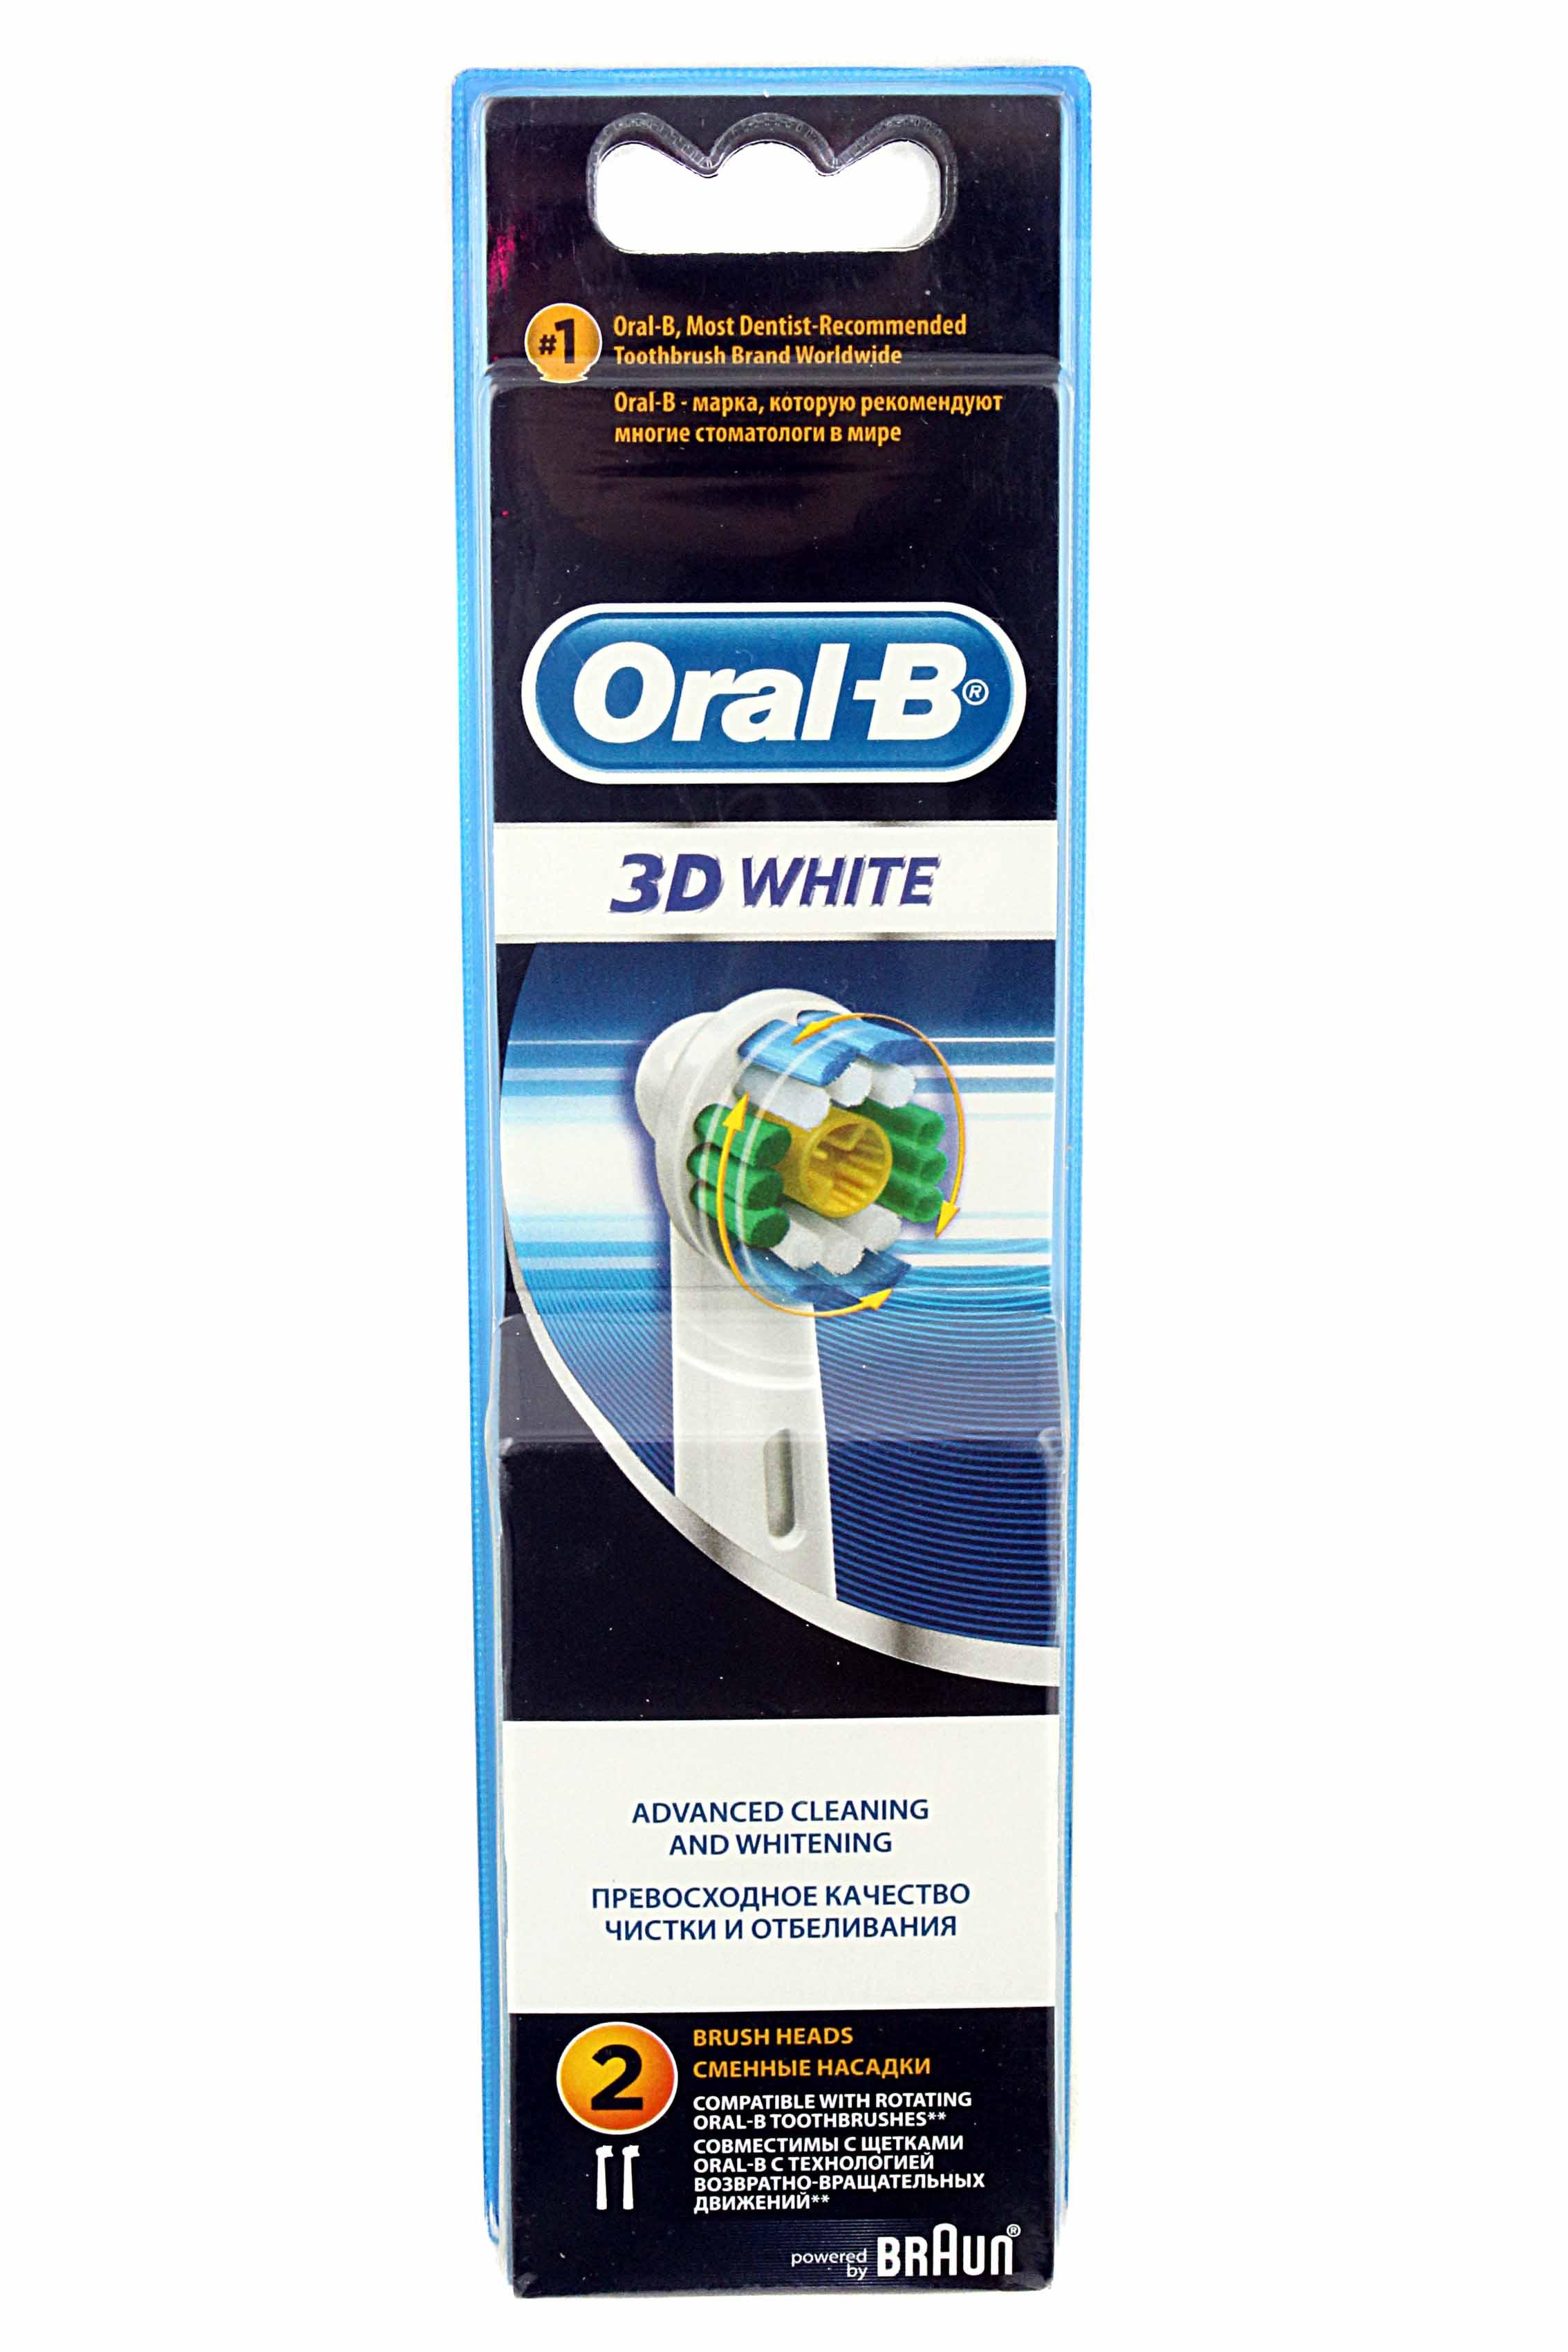 Насадки для эл. зубных щеток Braun от RBT.ru